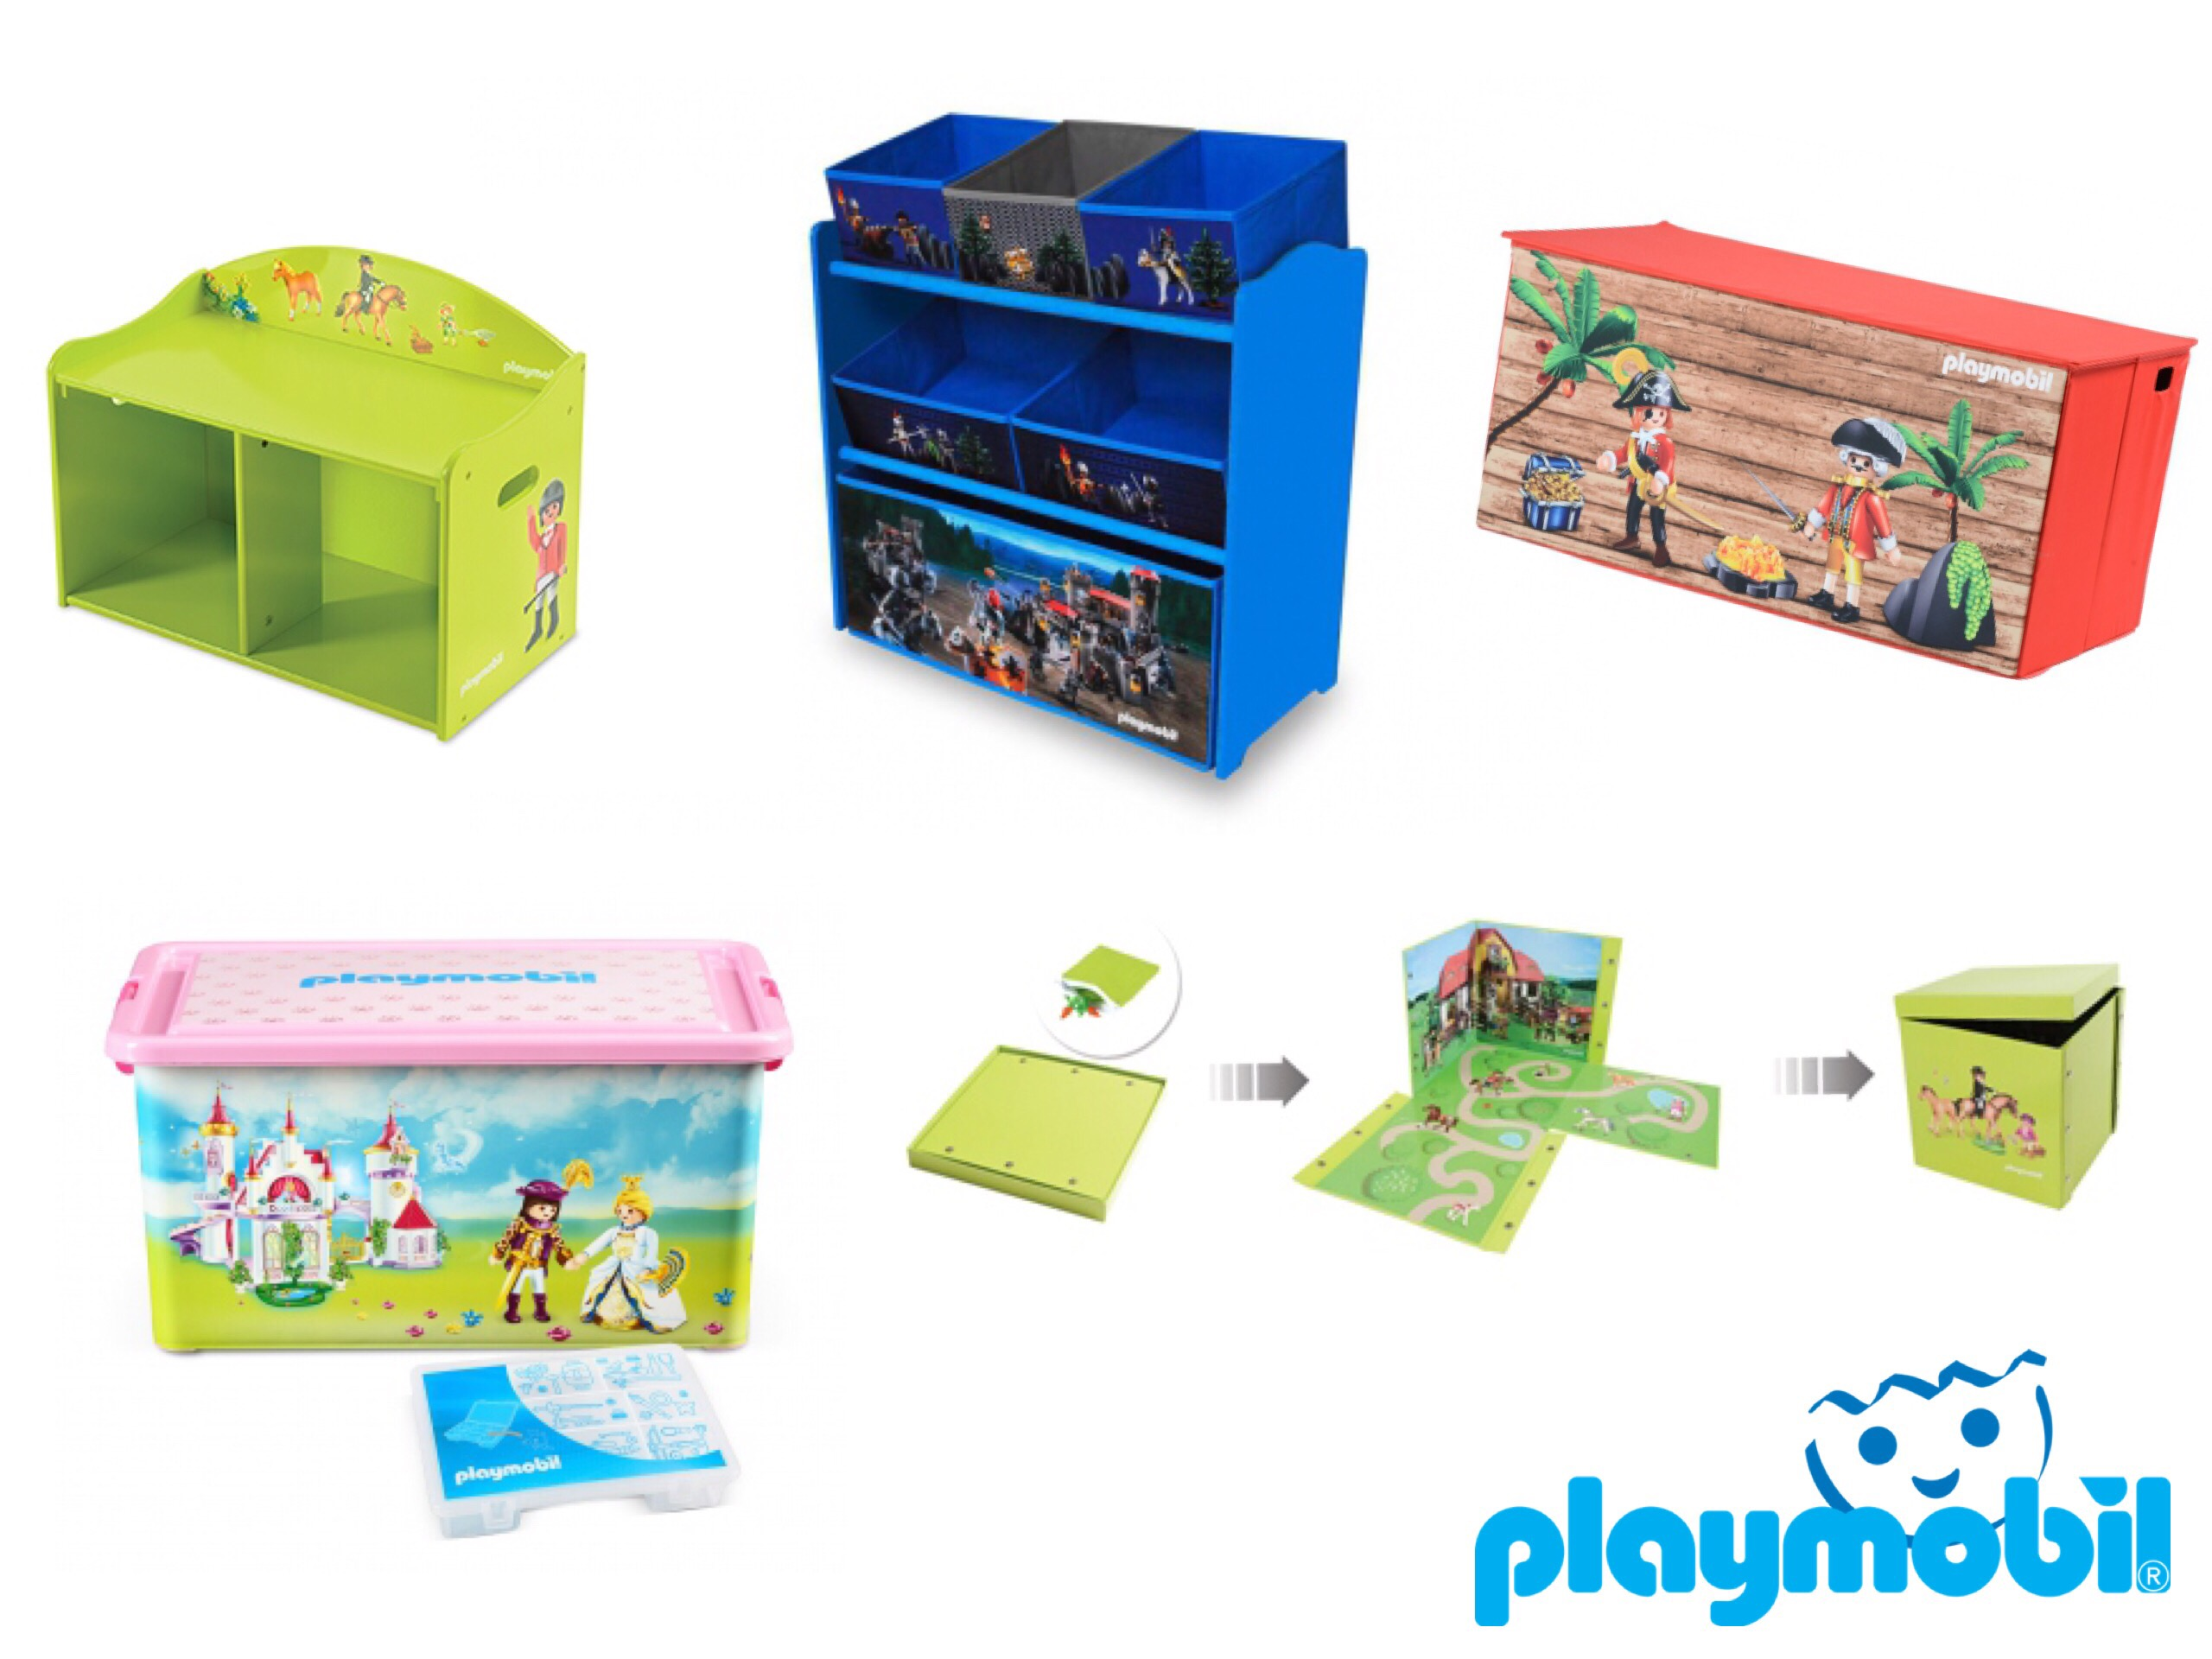 des playmobil bien rang s avec my note deco concours inside. Black Bedroom Furniture Sets. Home Design Ideas